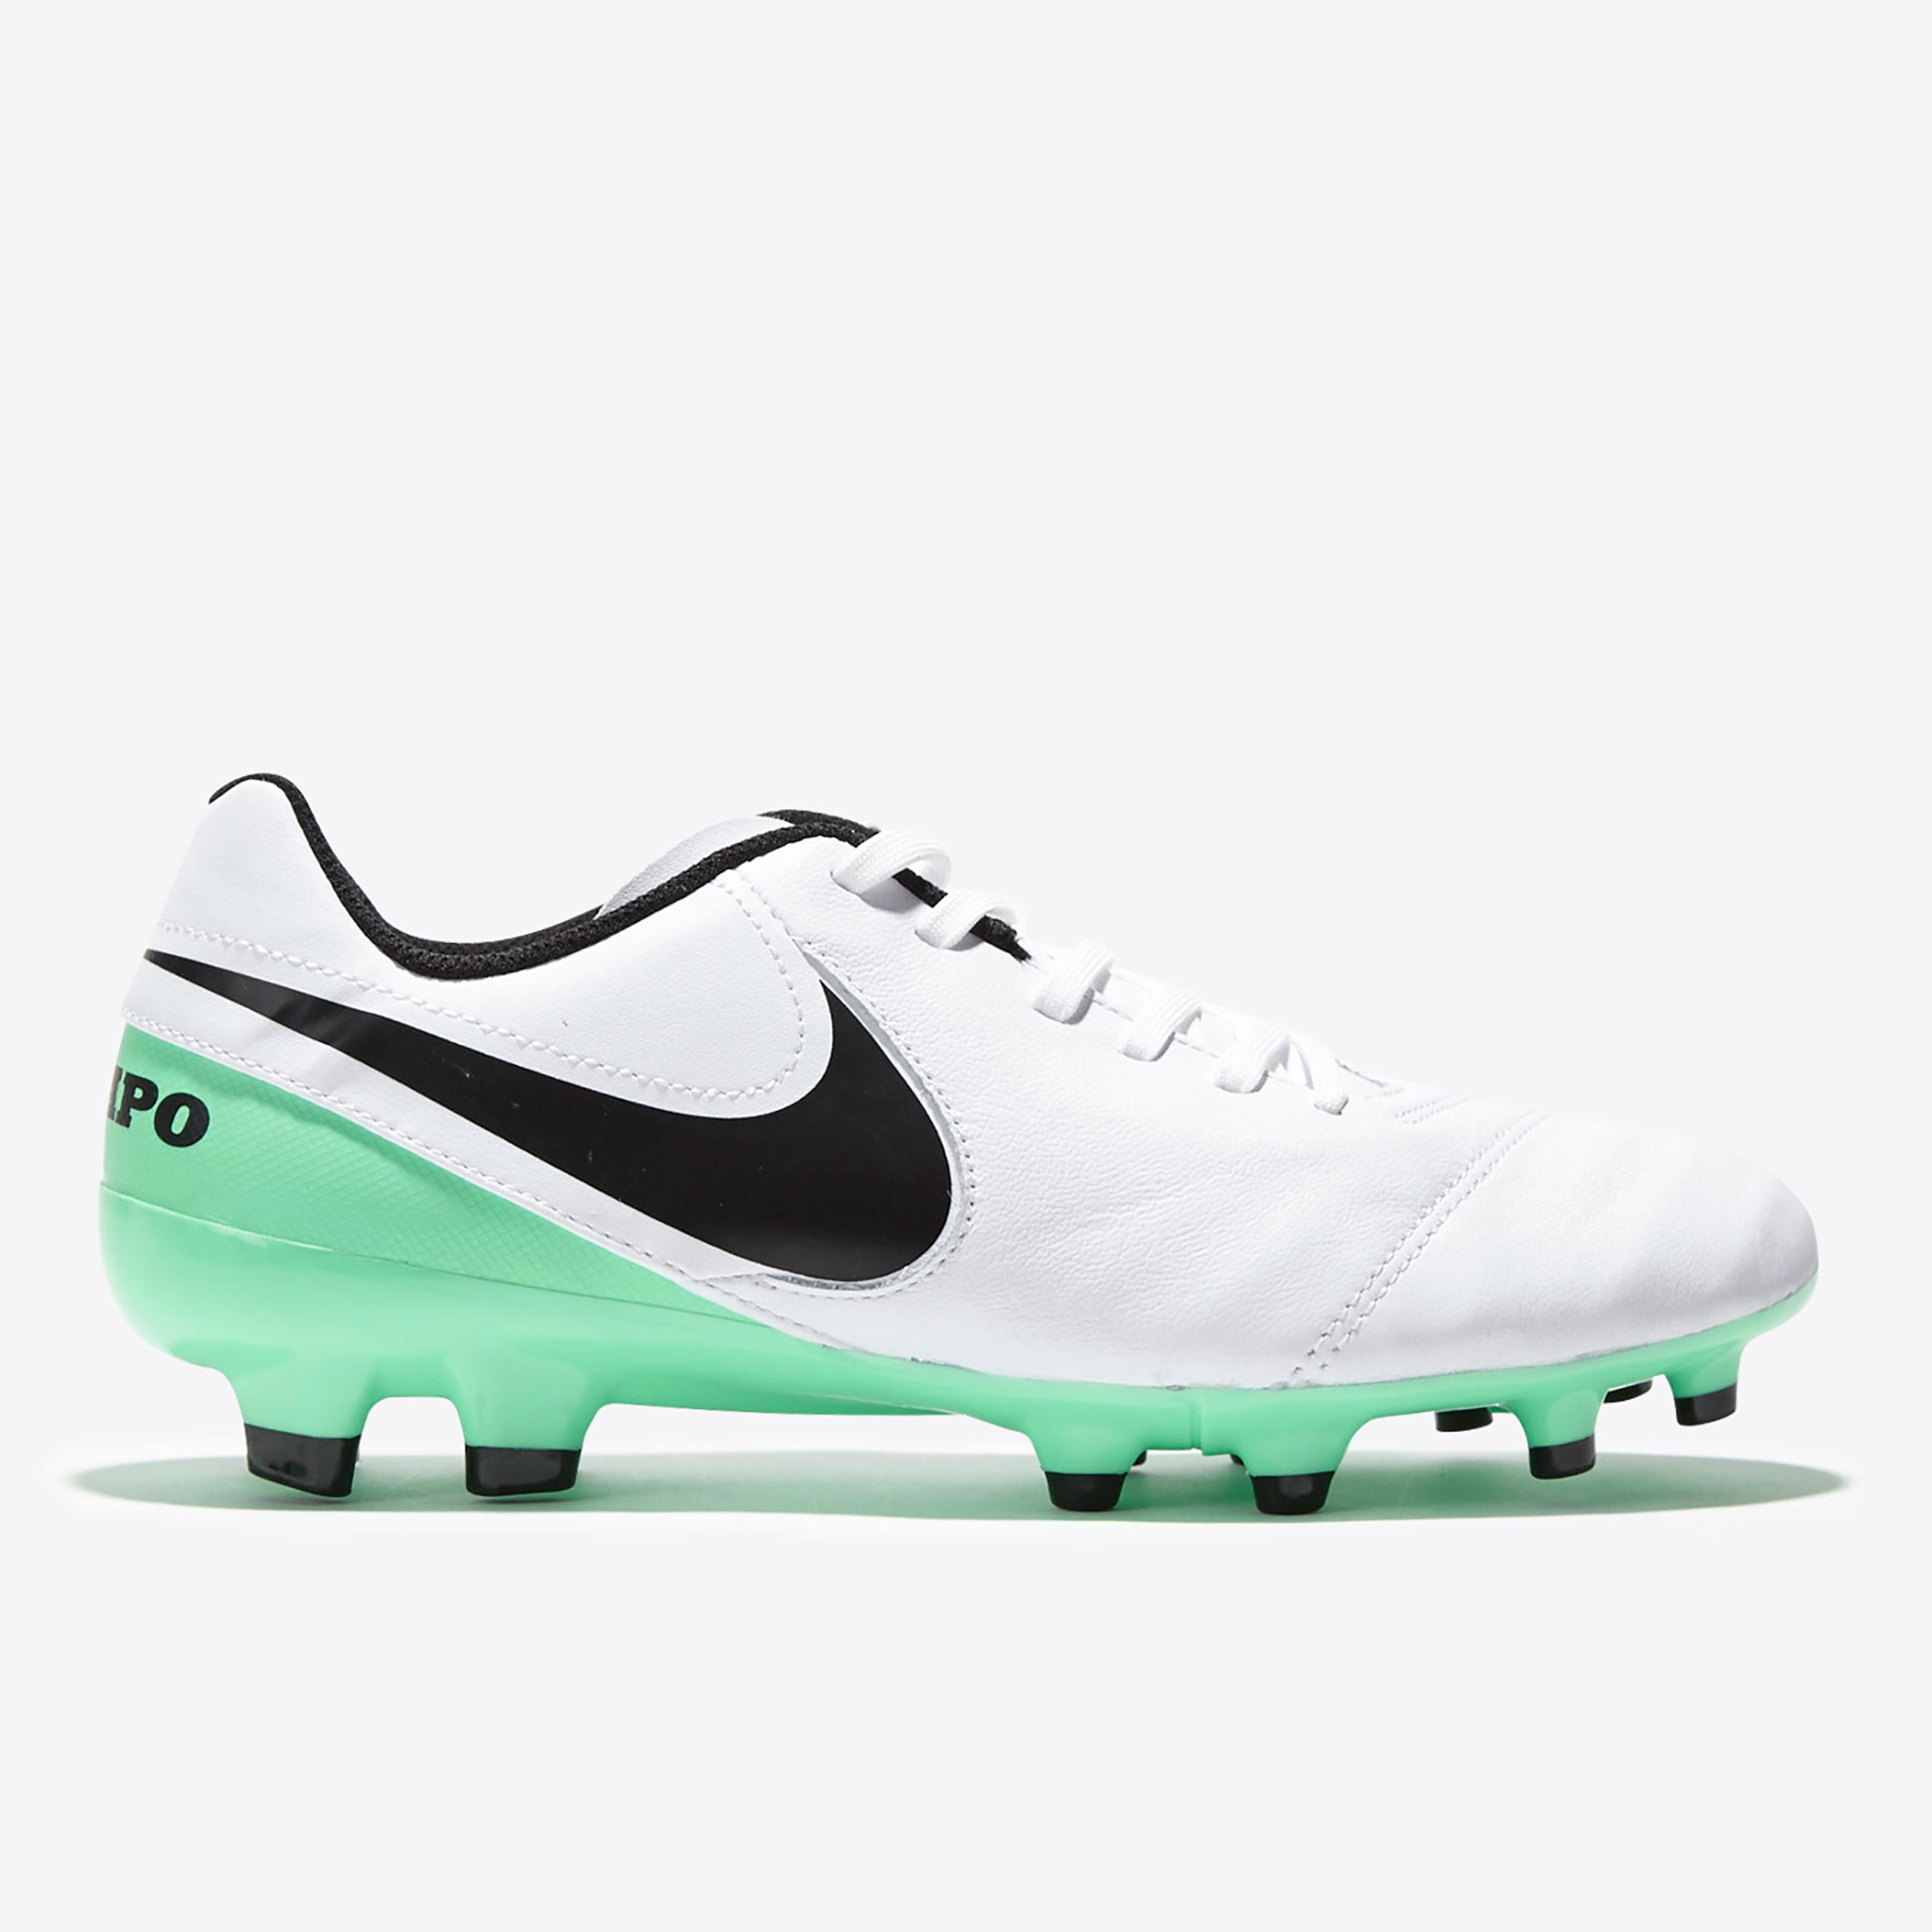 Nike Tiempo Legacy II Firm Ground Football Boots - White/Black/Electro